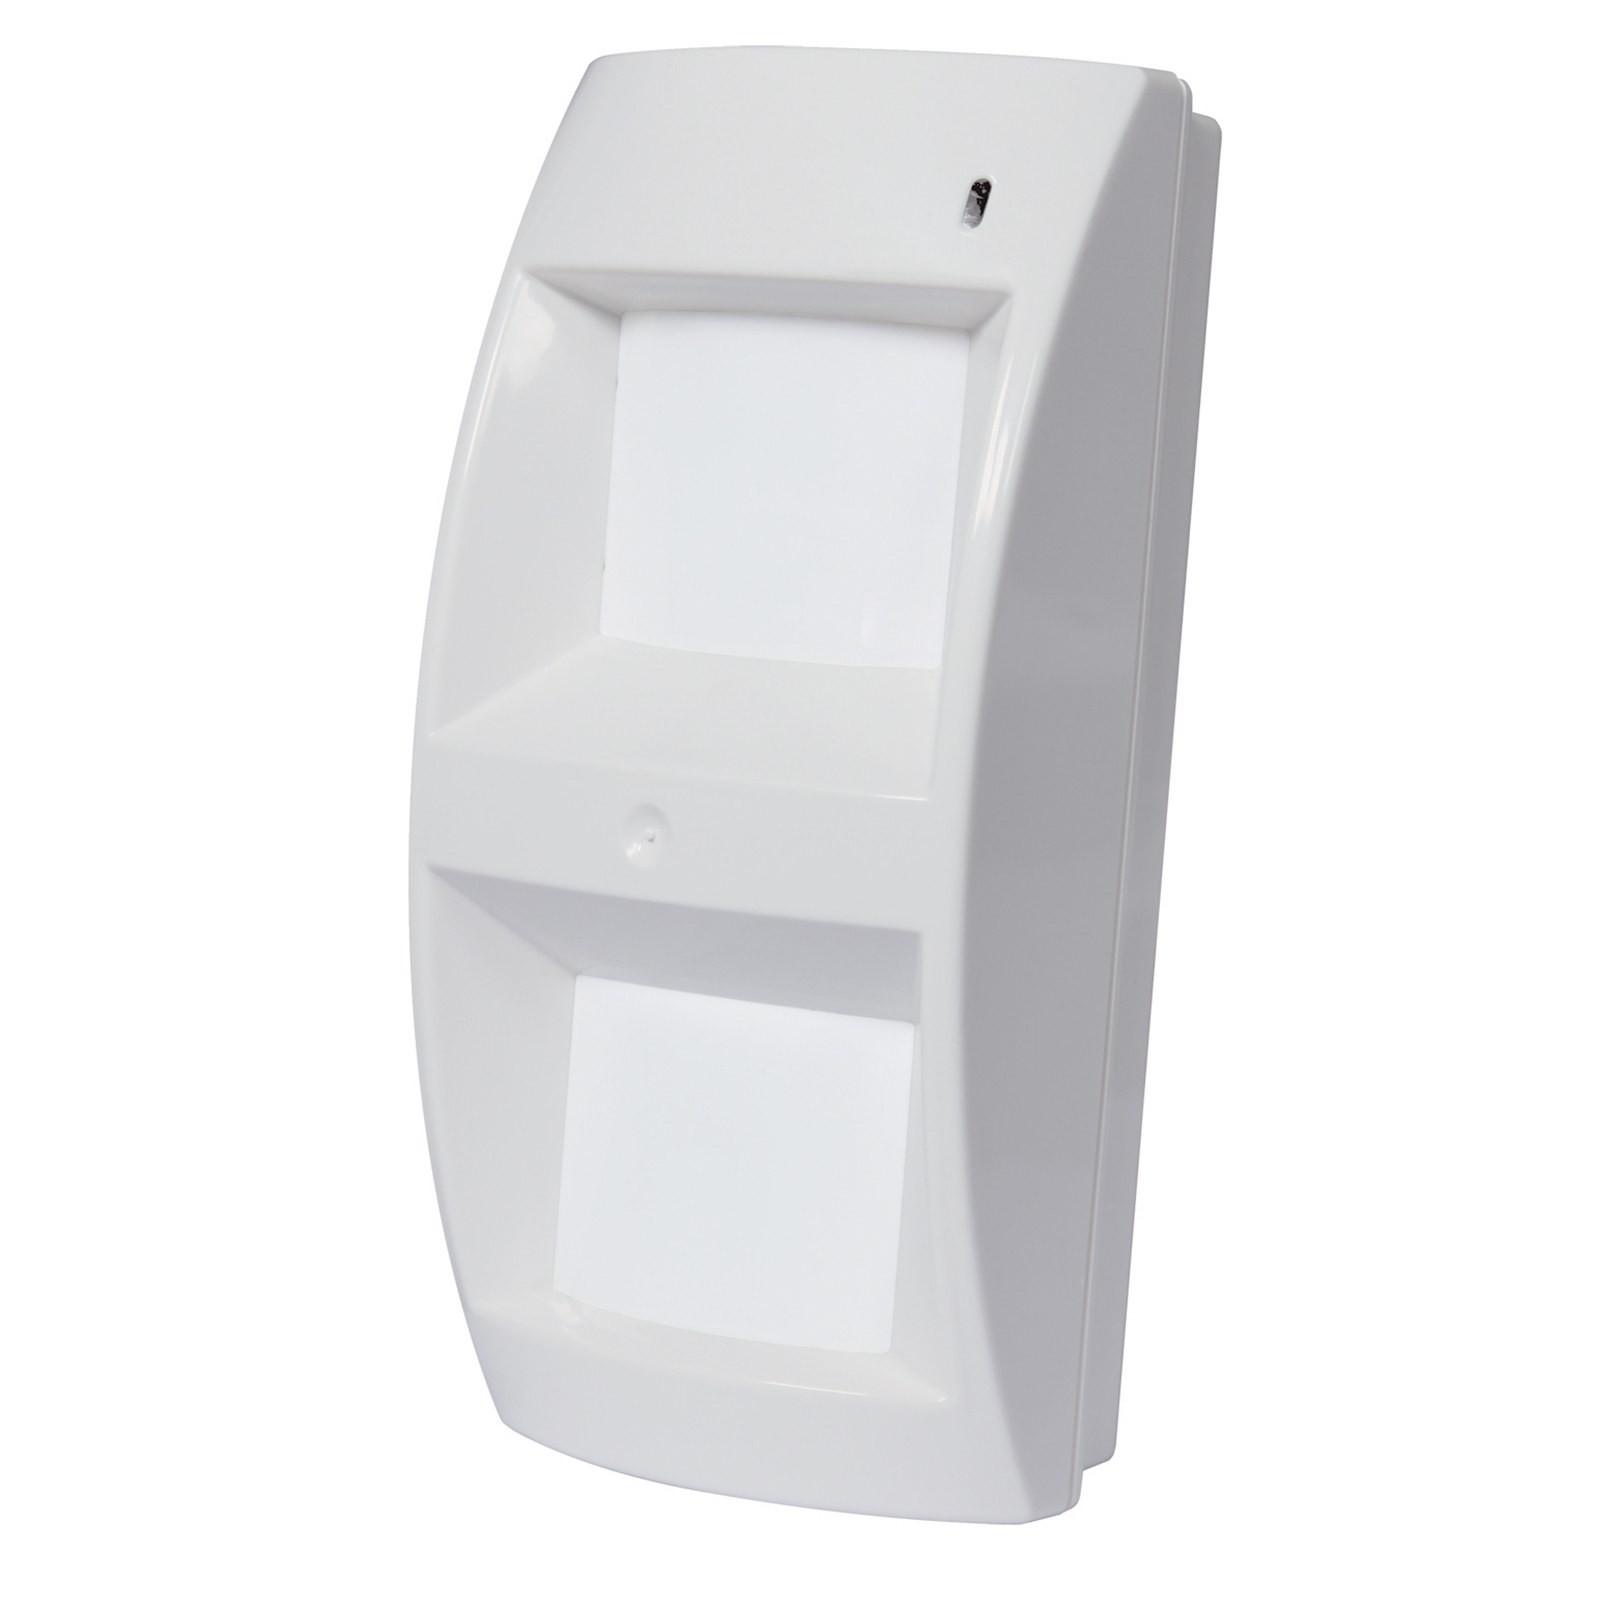 Sensore volumetrico per allarme pir da esterno a tripla - Allarme volumetrico esterno ...